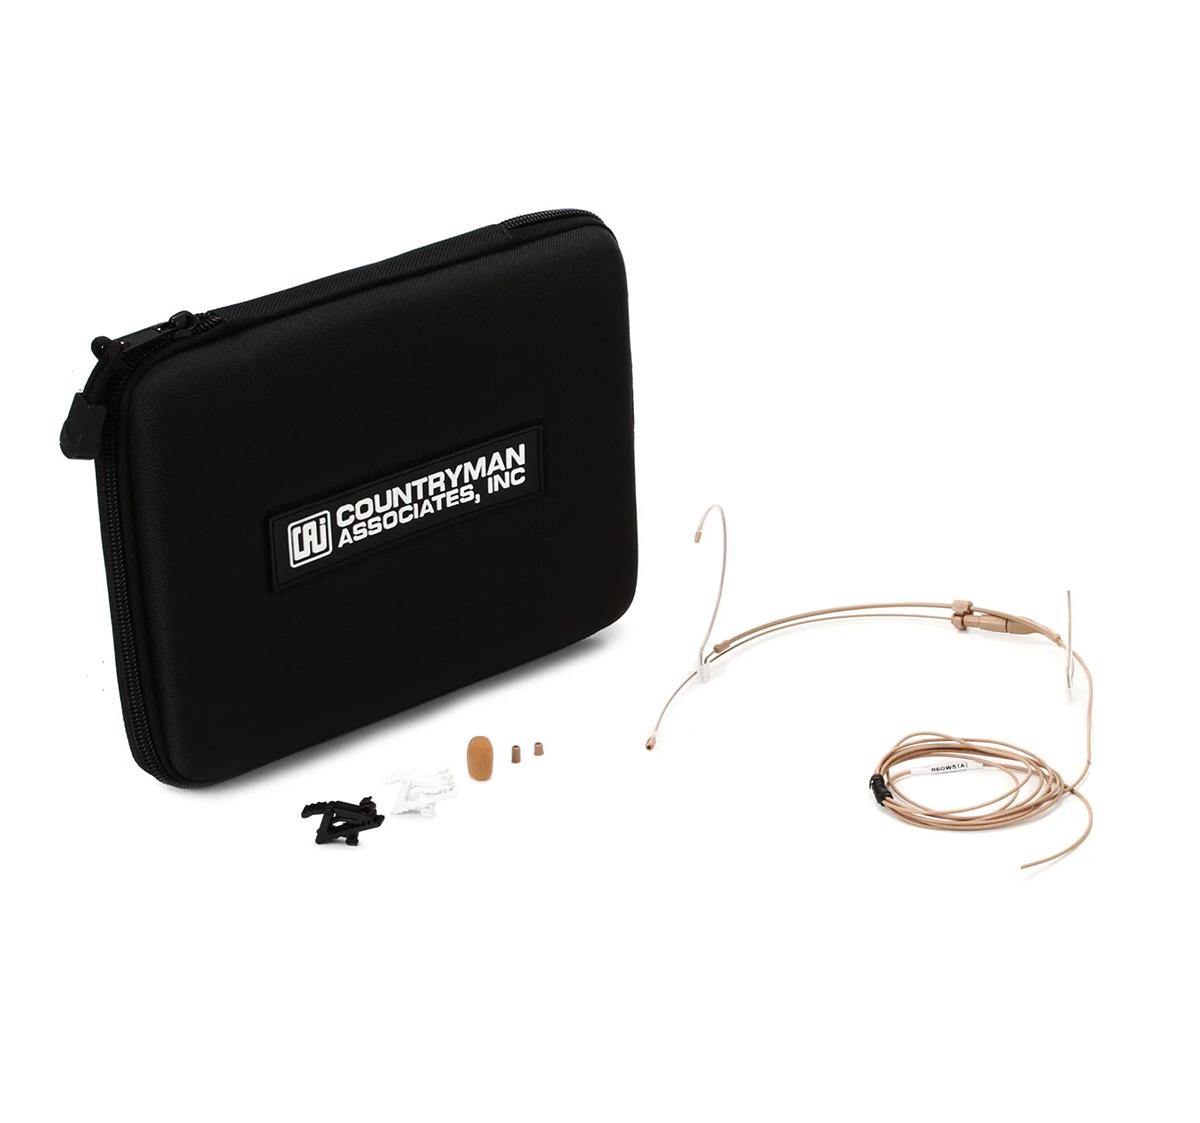 MICROFONE HEADSET COUNTRYMAN H6 TA4F (SHURE/BEYERDYNAMIC)